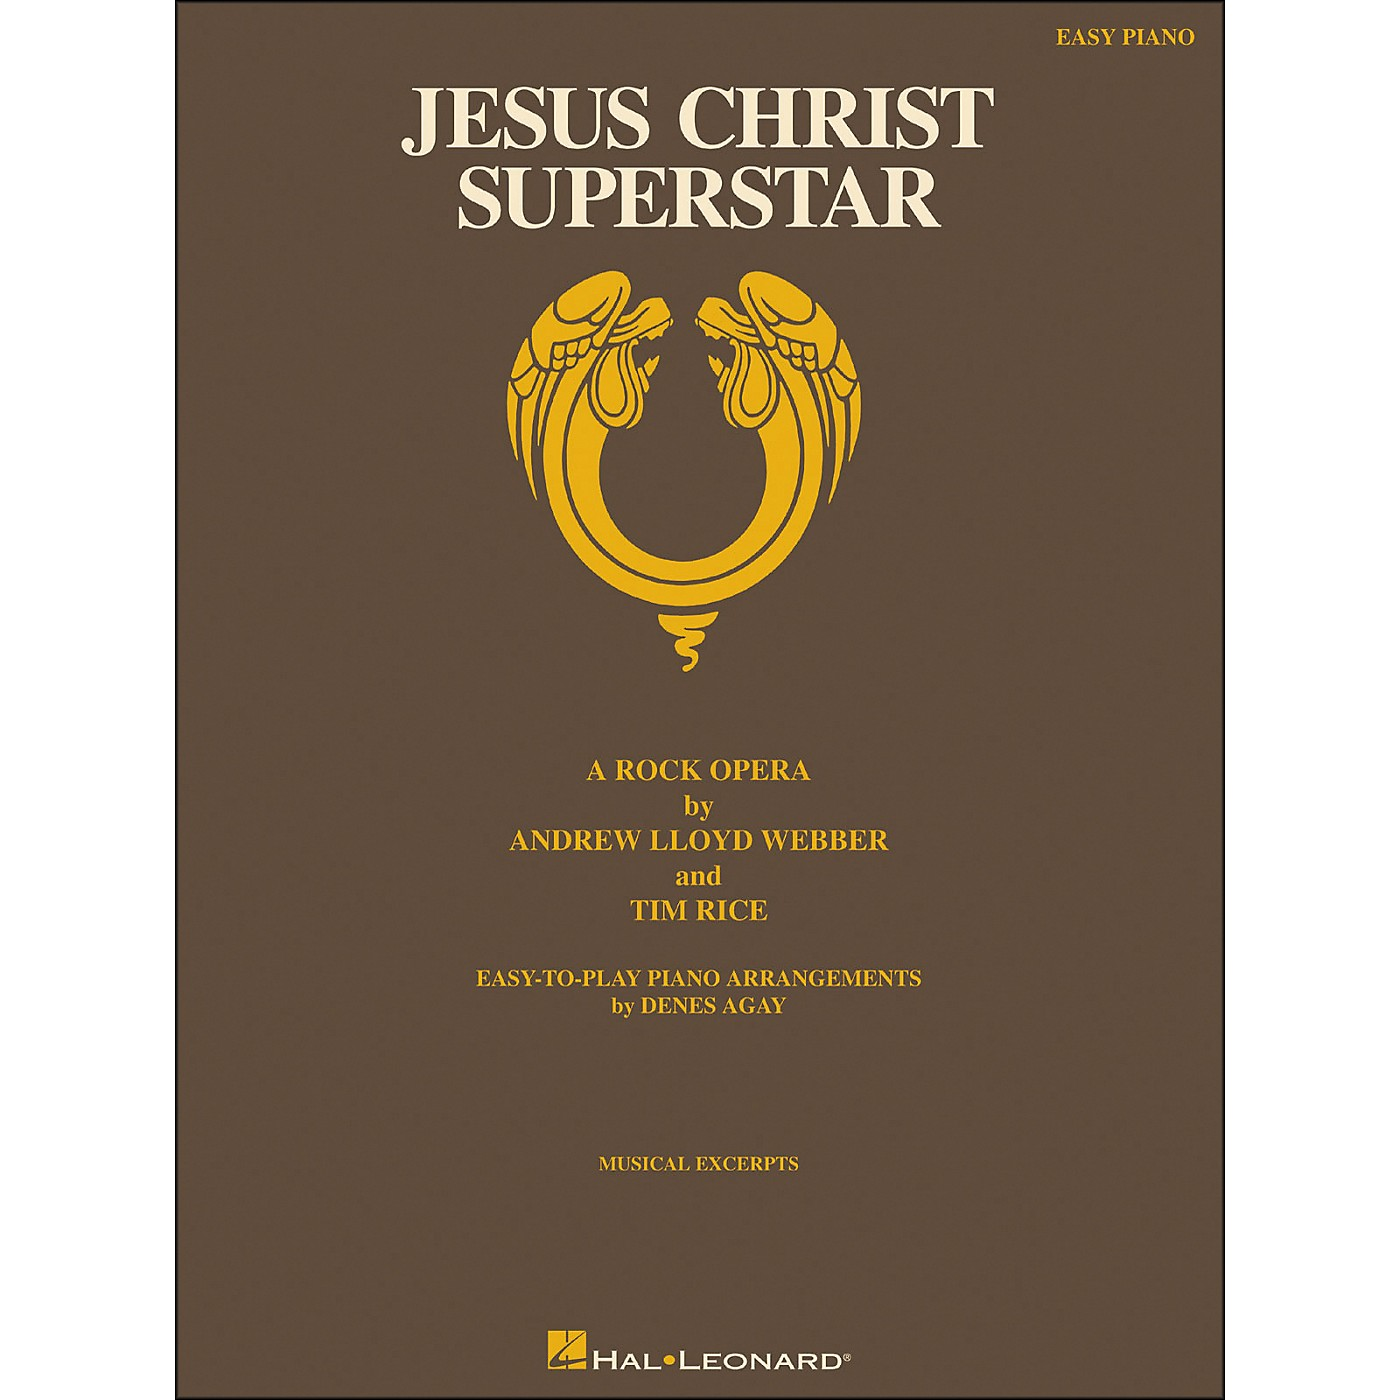 Hal Leonard Jesus Christ Superstar for Easy Piano thumbnail